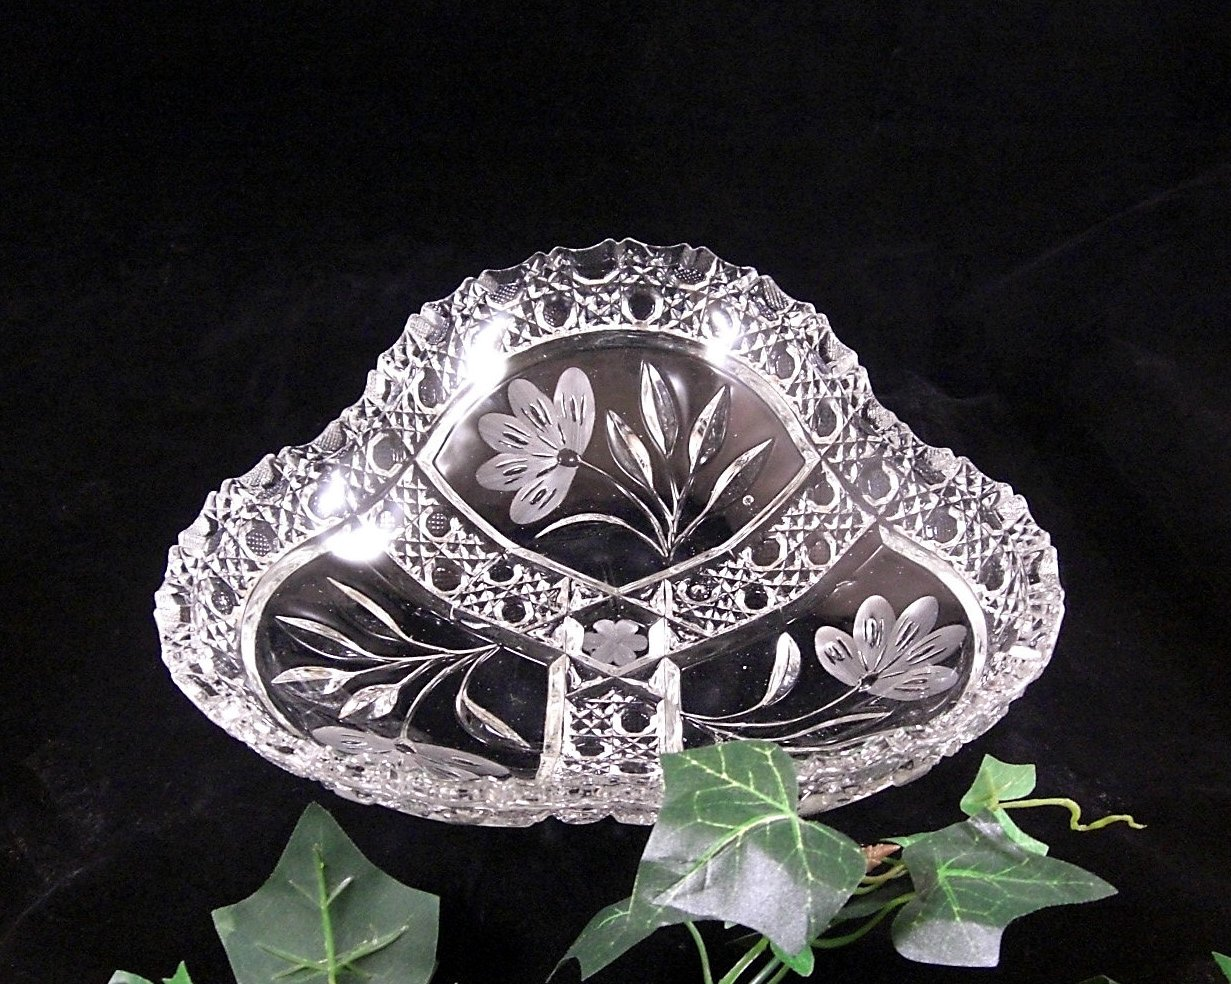 Antique ABP Glass Tri Corner Bowl c1900 Sawtooth, Floral and Cane